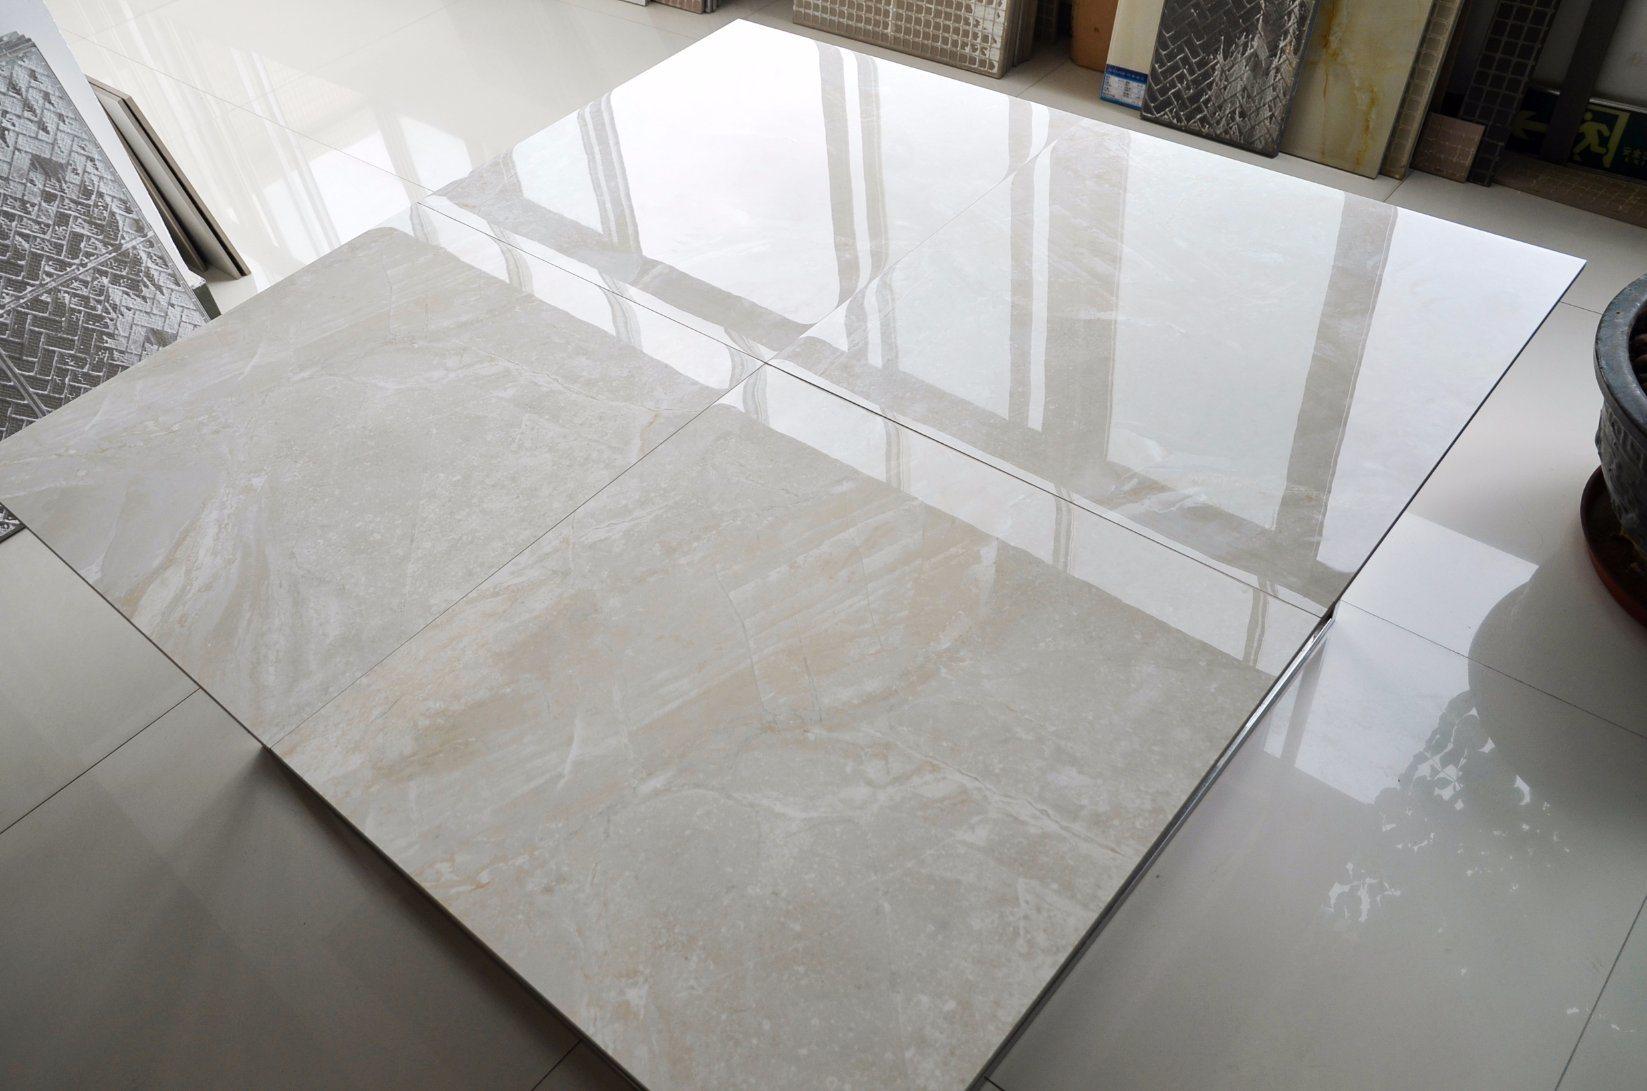 China Building Material In Spanish Porcelain Standard Ceramic Tile